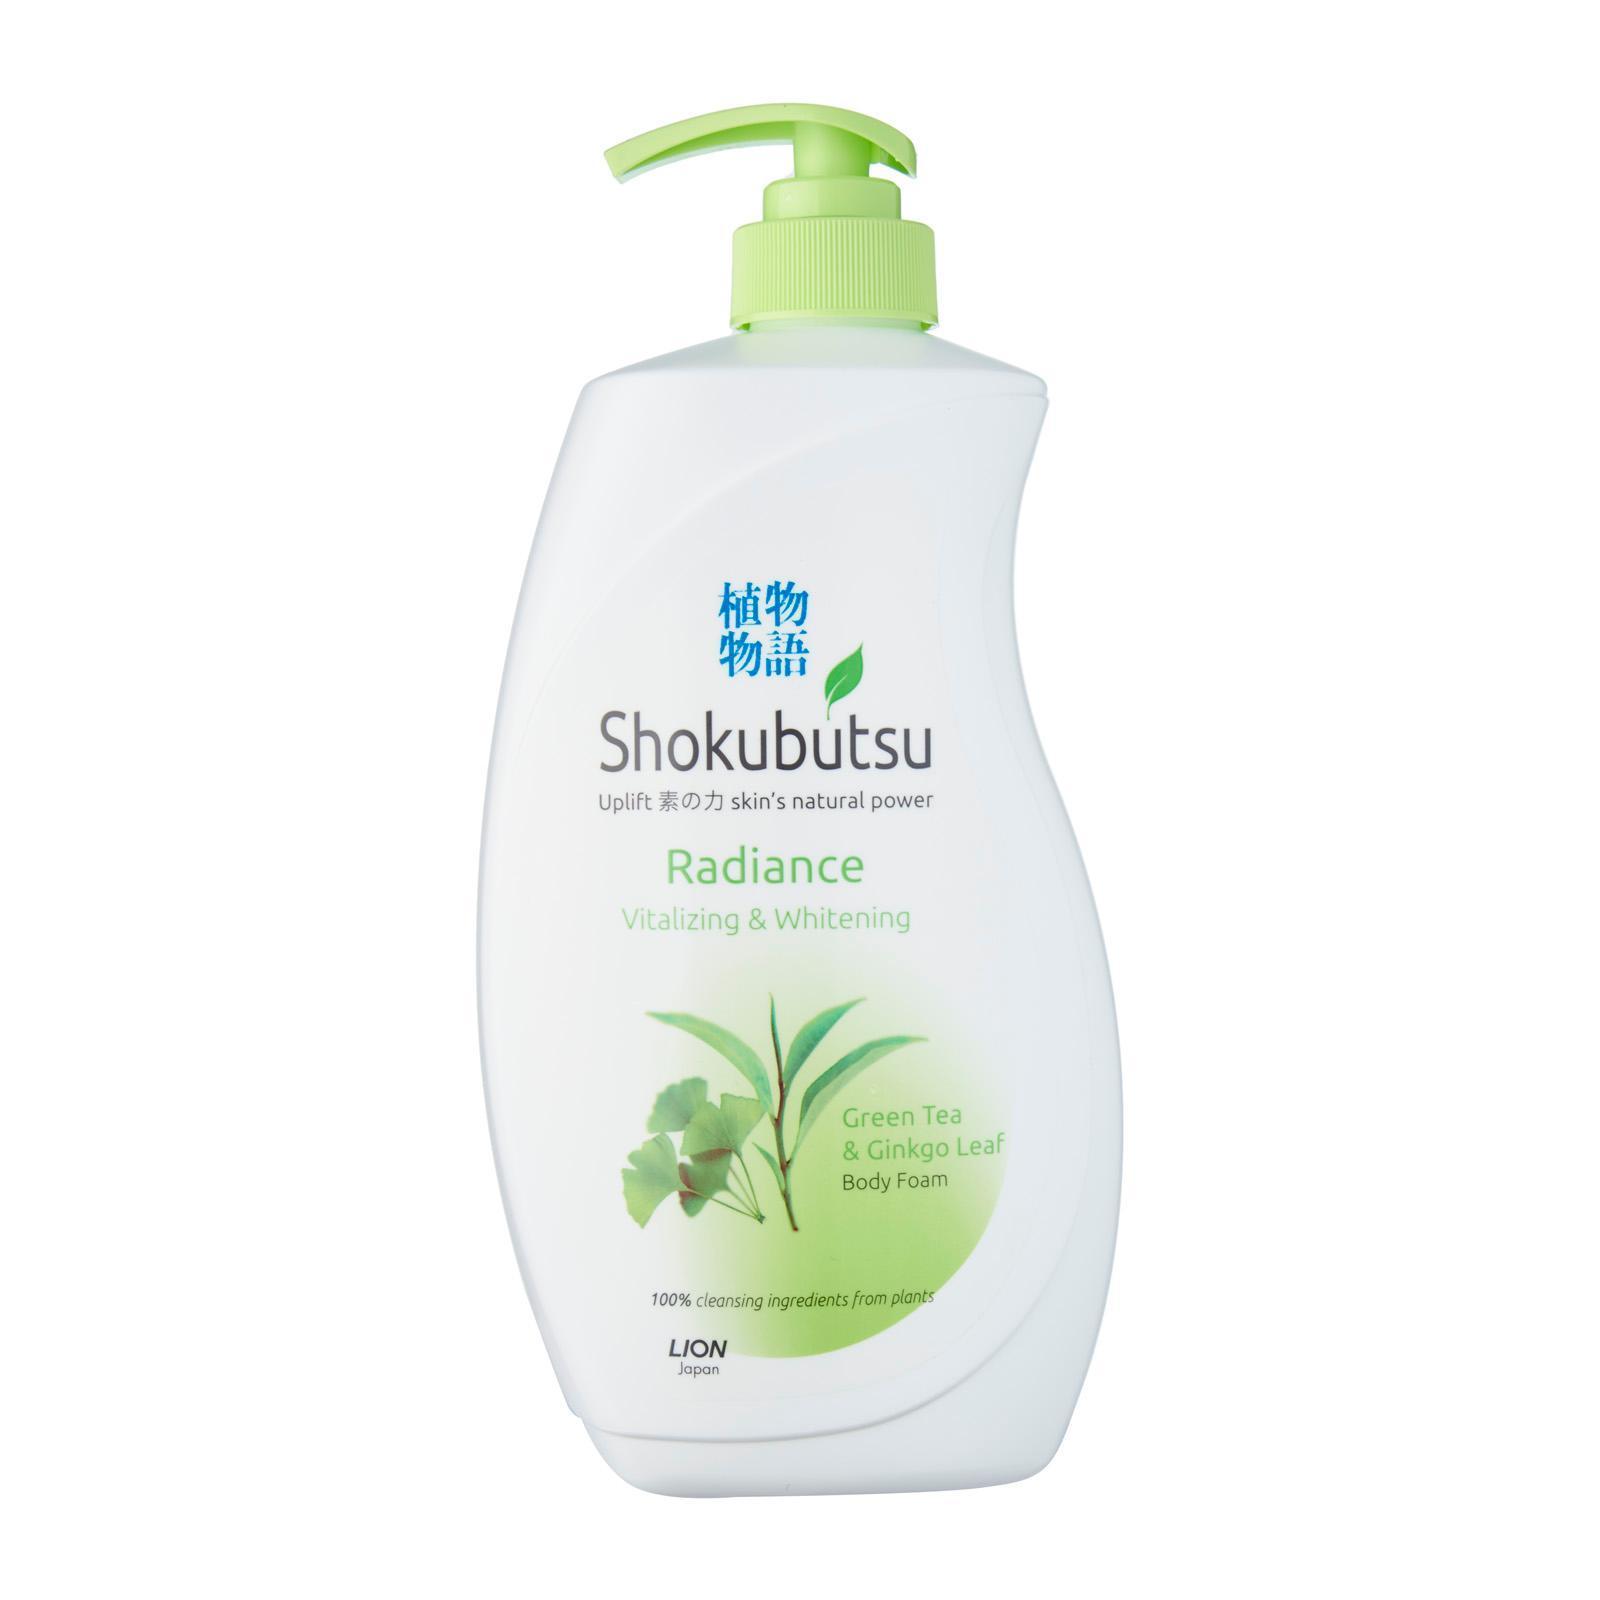 Shokubutsu Radiance Body Foam - Vitalizing and Whitening